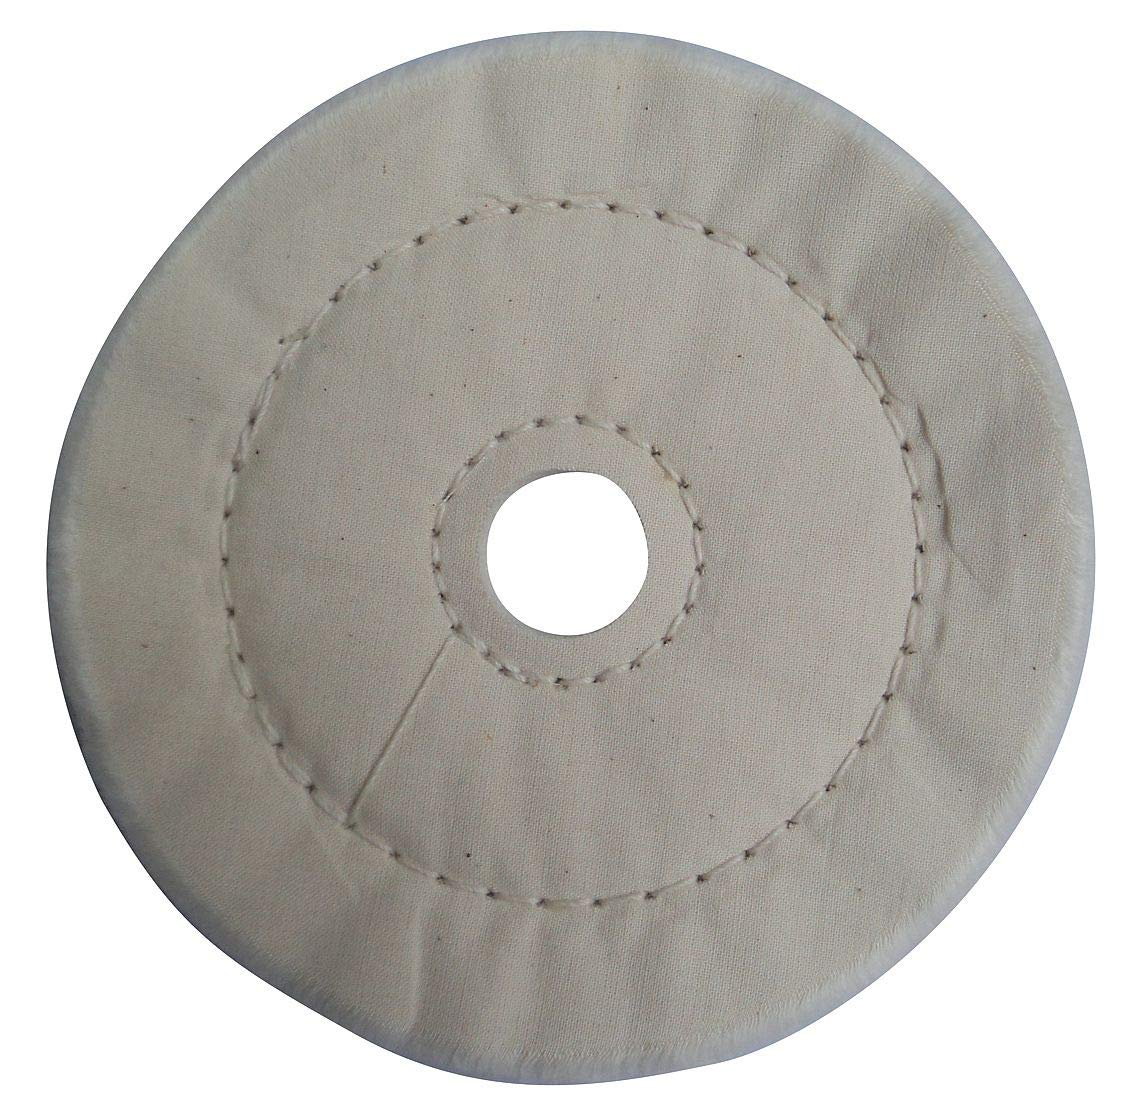 Buffing Wheel, Cushion Sewn, 10 In Dia. - 12U101 (Pack of 2)